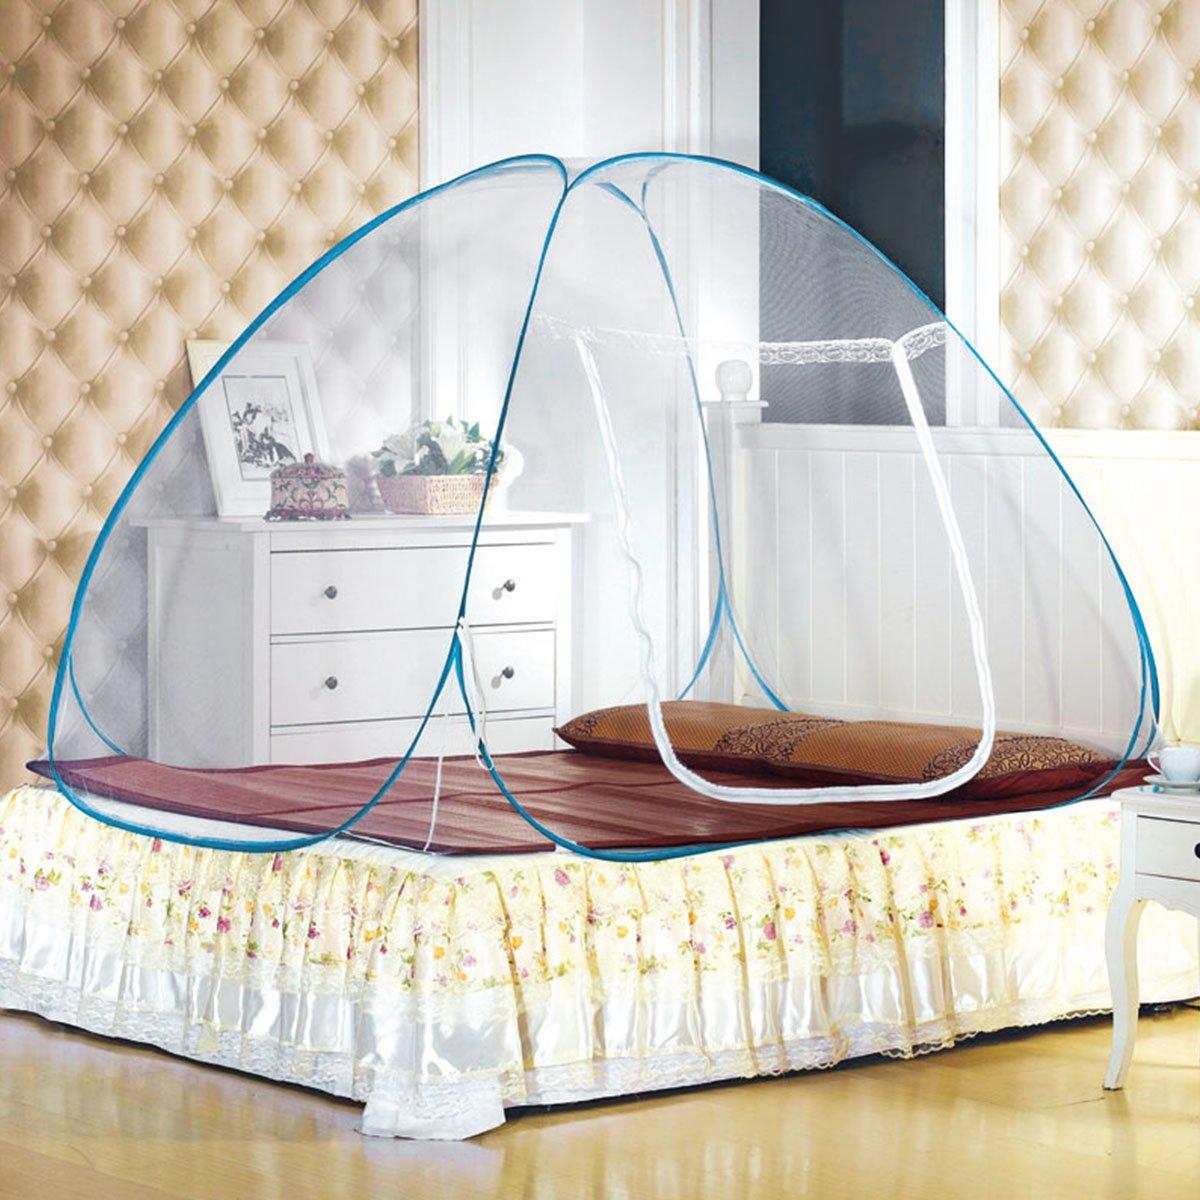 LEOSO Portable Folding Pop Up Mosquito Net Travel Camping Tent (M=150cm*200cm*138cm,59'' x 78.7'' x 54.3'' blue)